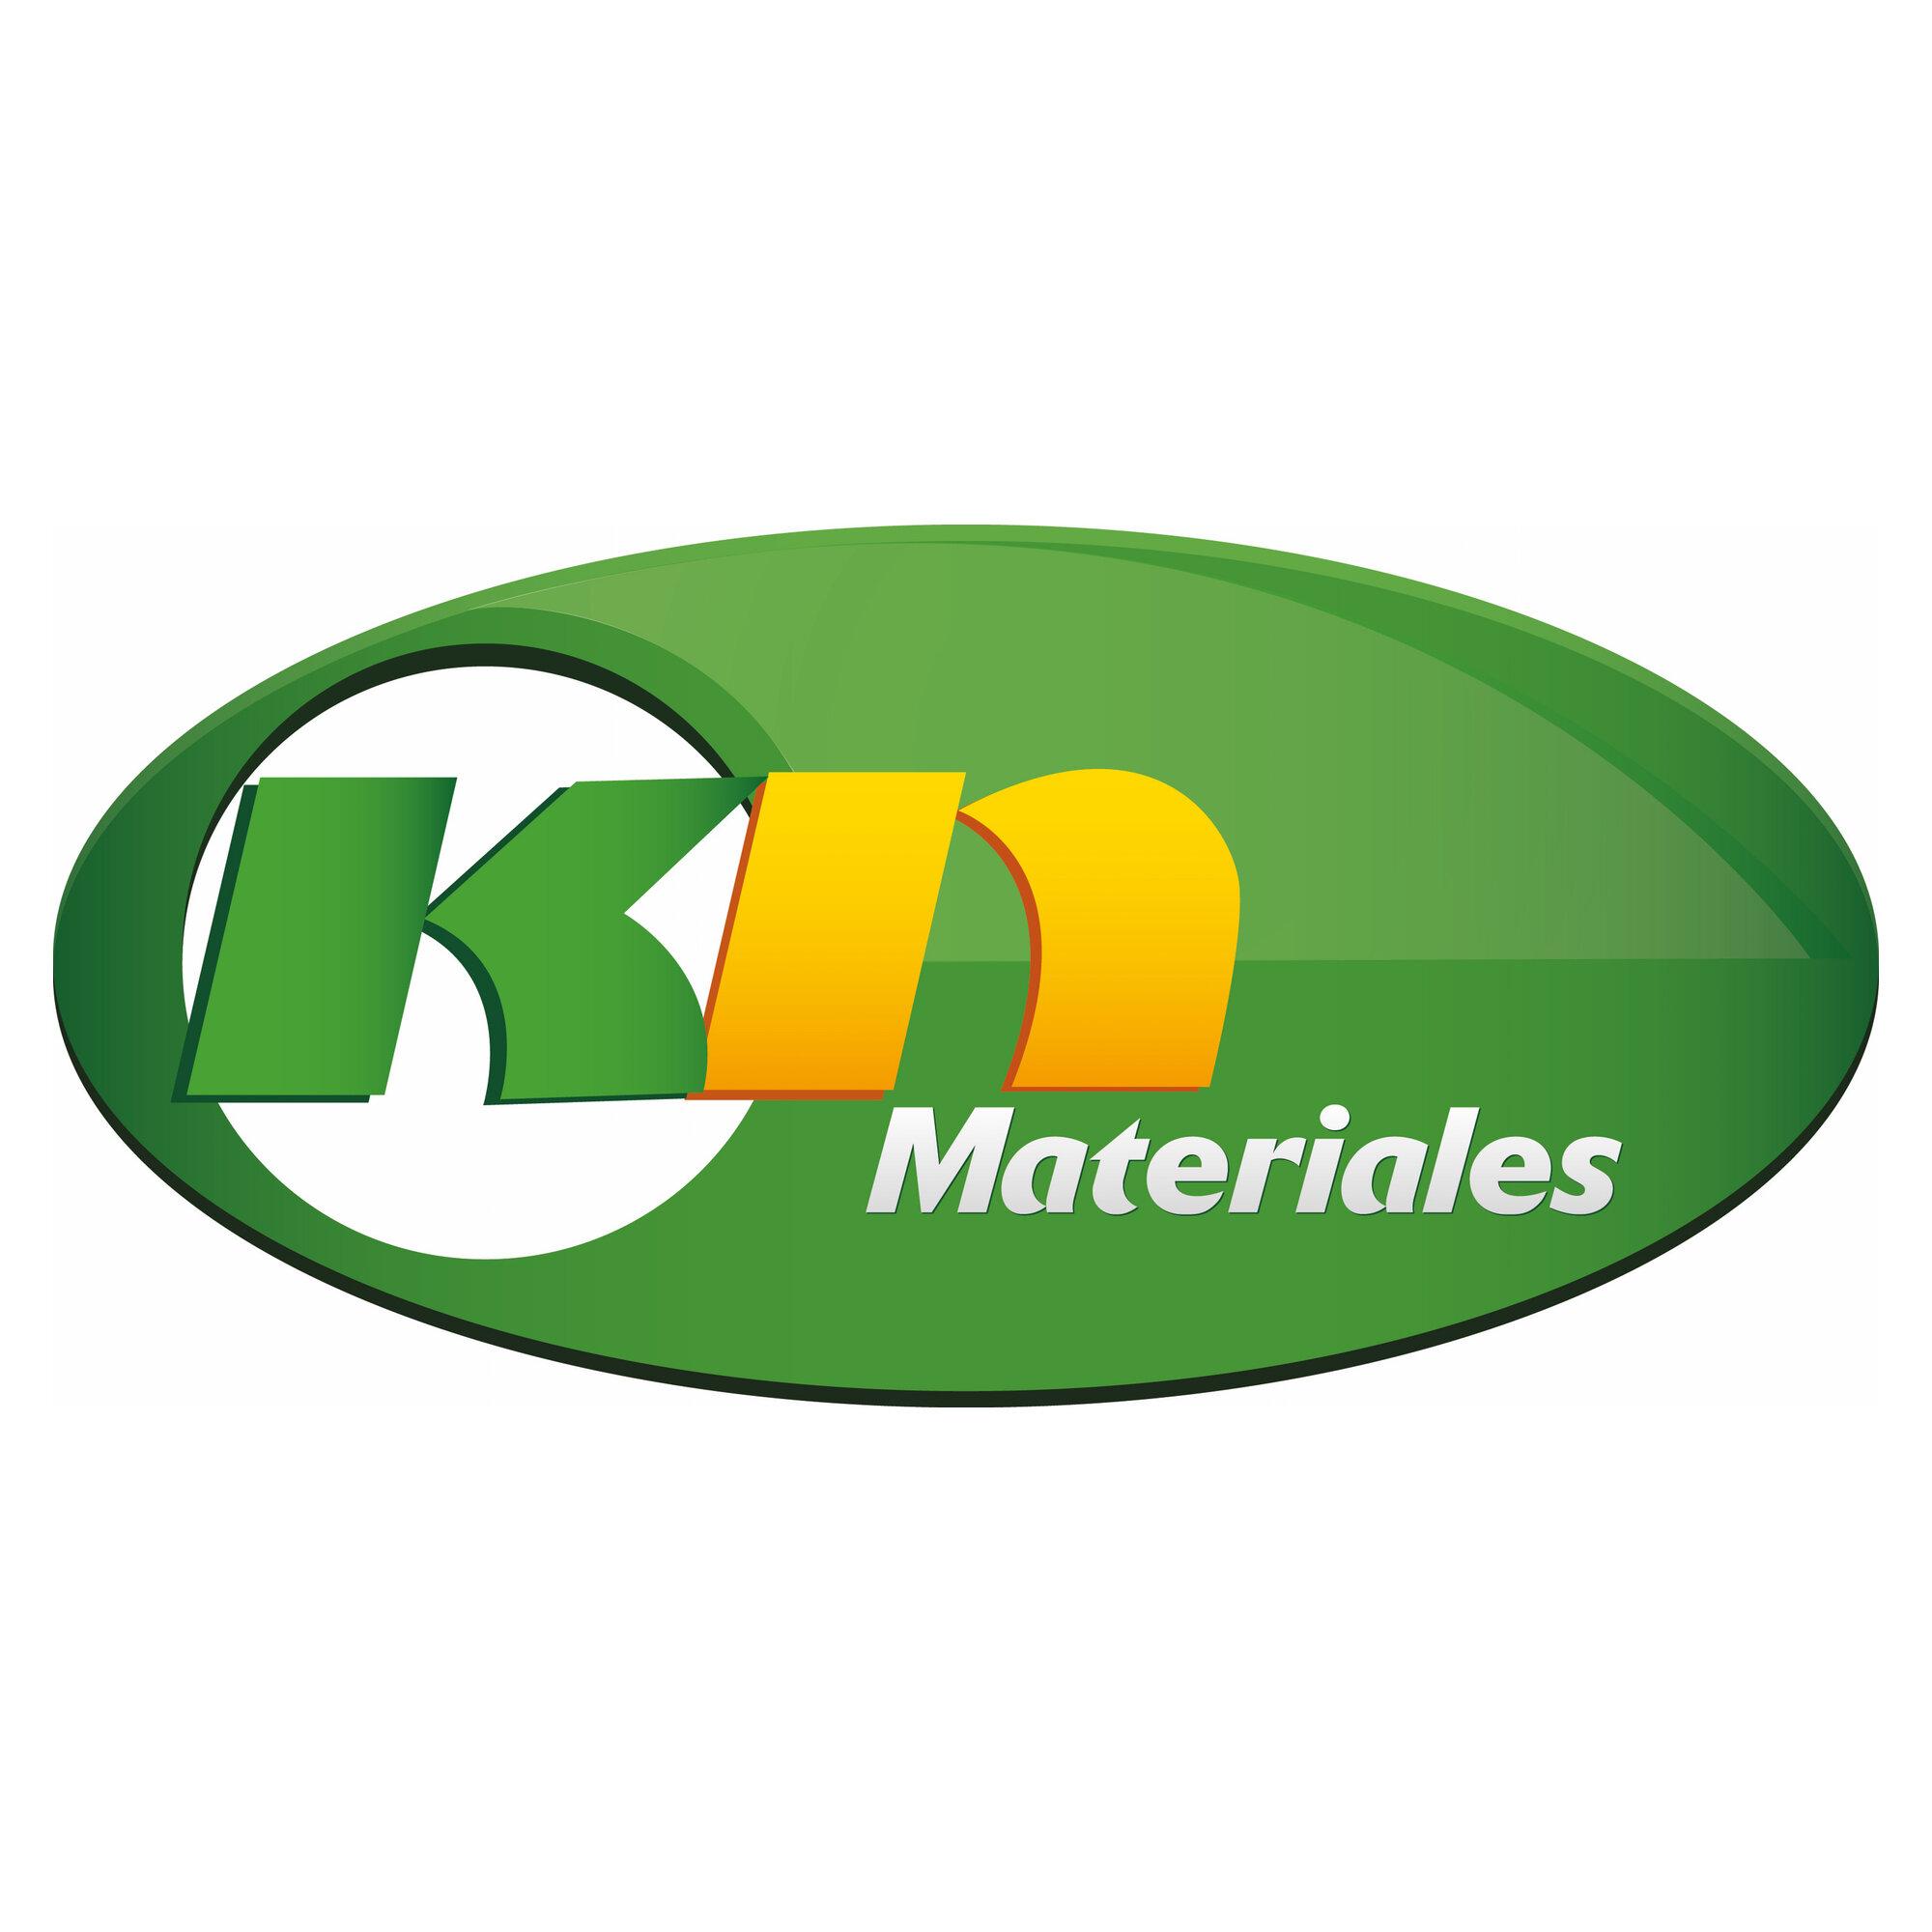 07 kn materiales.jpg